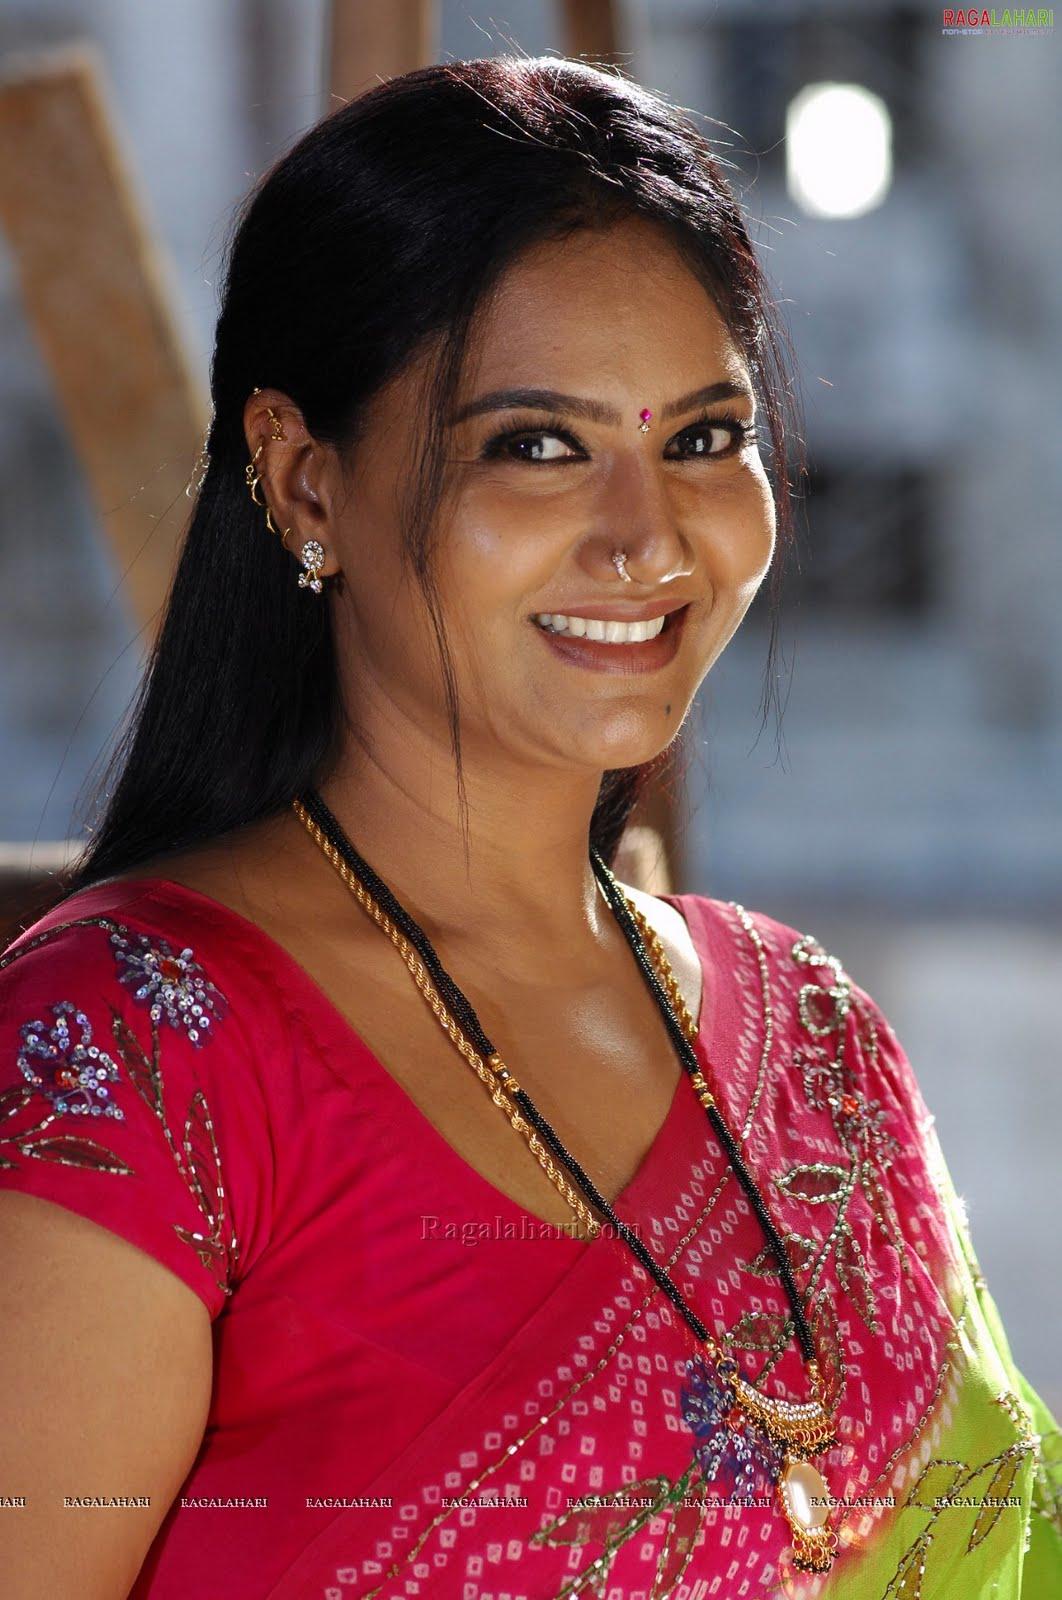 raksha aunty mallu saree aunties tollywood actresses fuck masala a4 adult